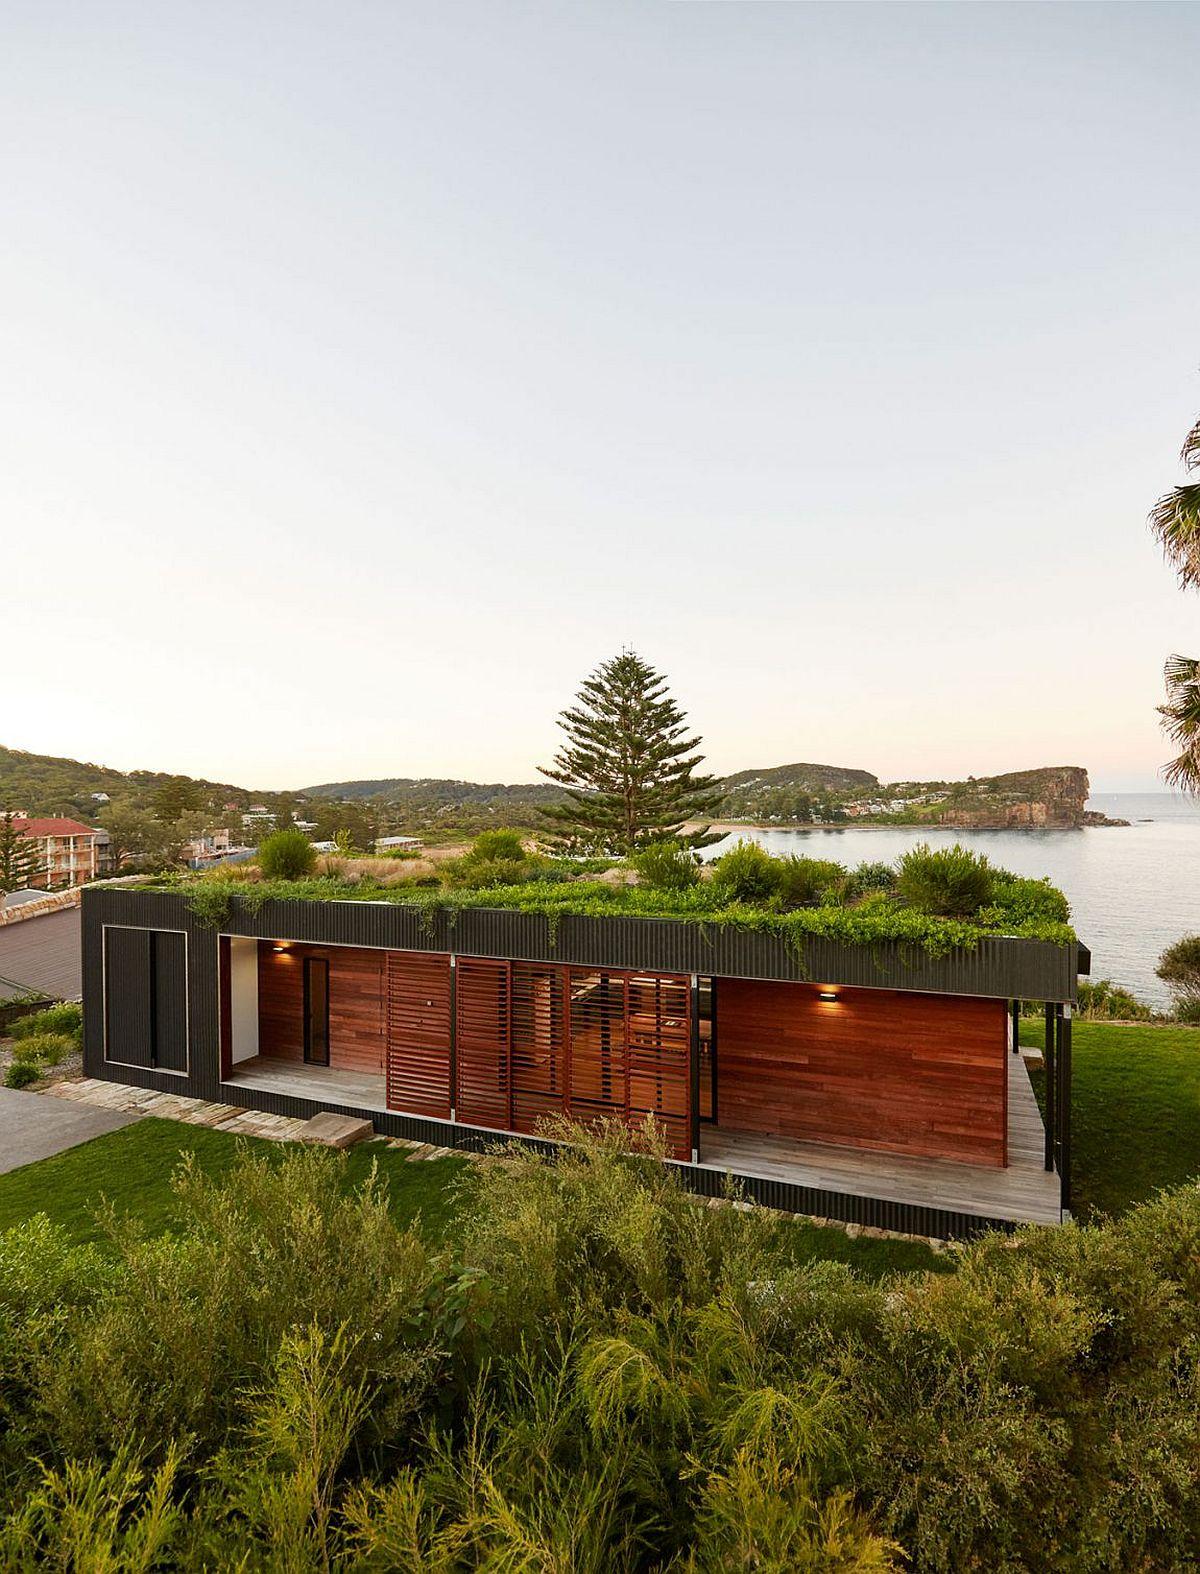 Modern sustainable modular home designed to cause minimal eco-impact